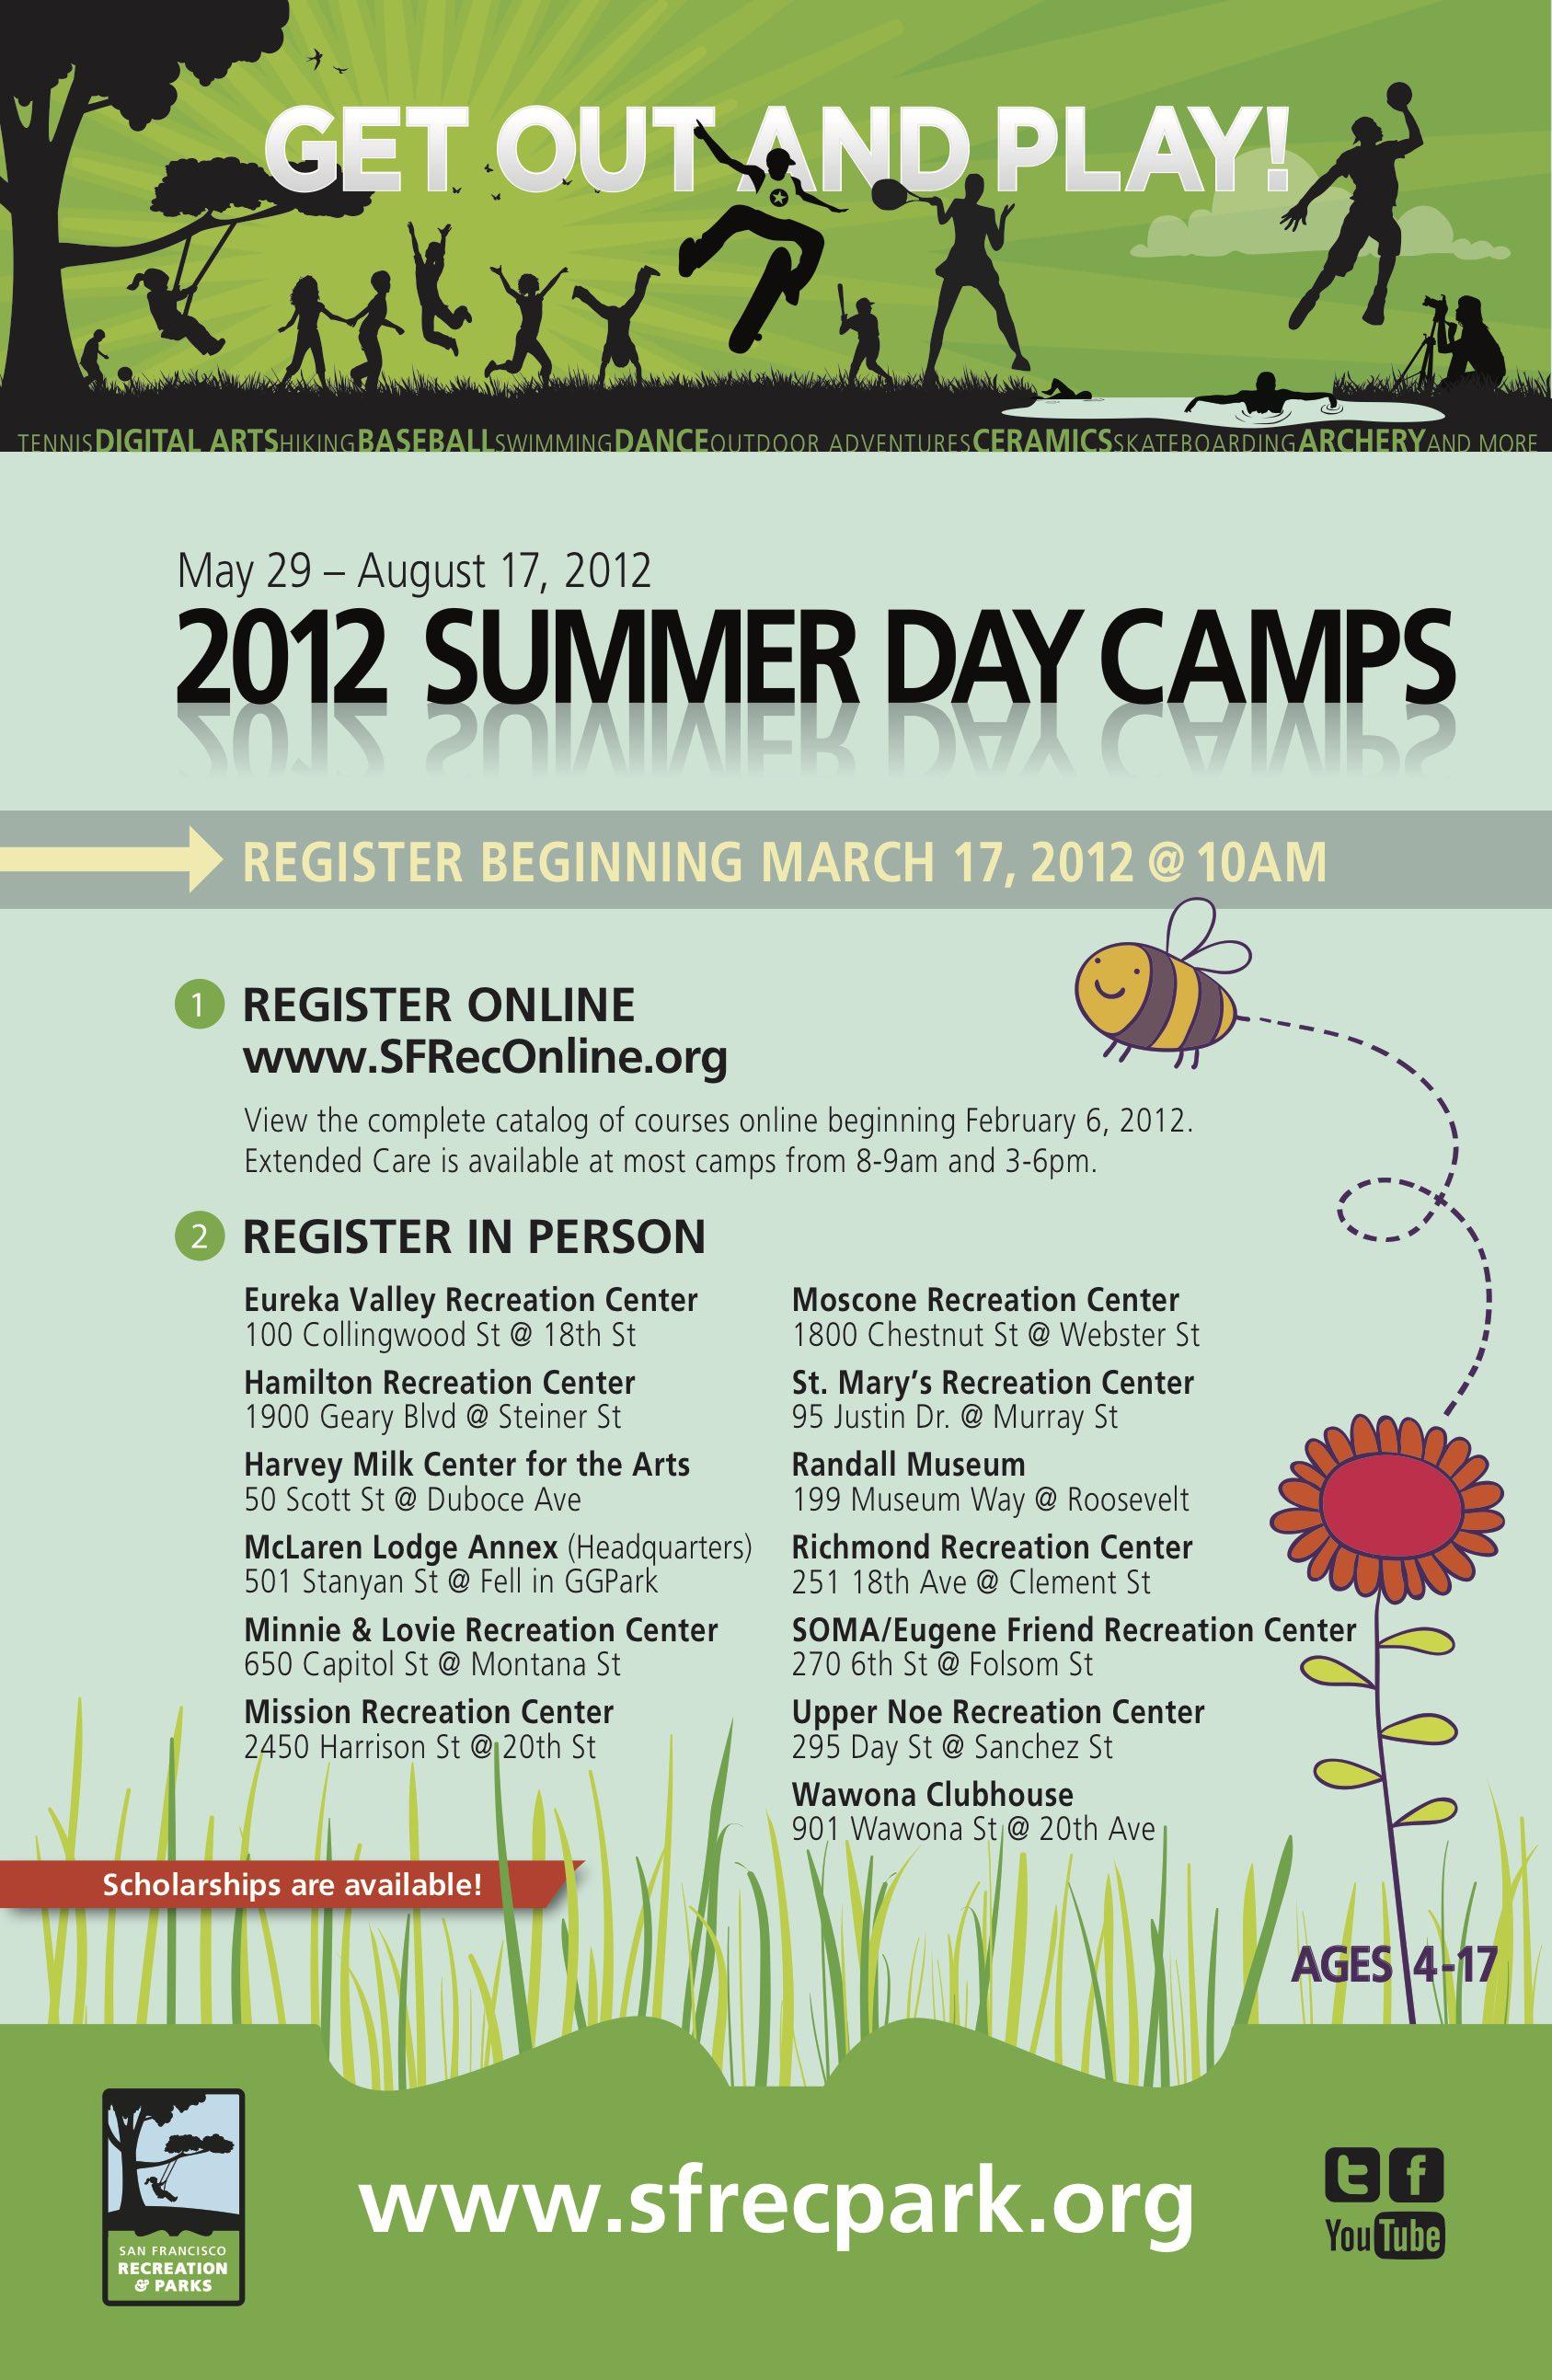 SUMMER_DAY CAMP_POSTER_11X17_2012C.jpg